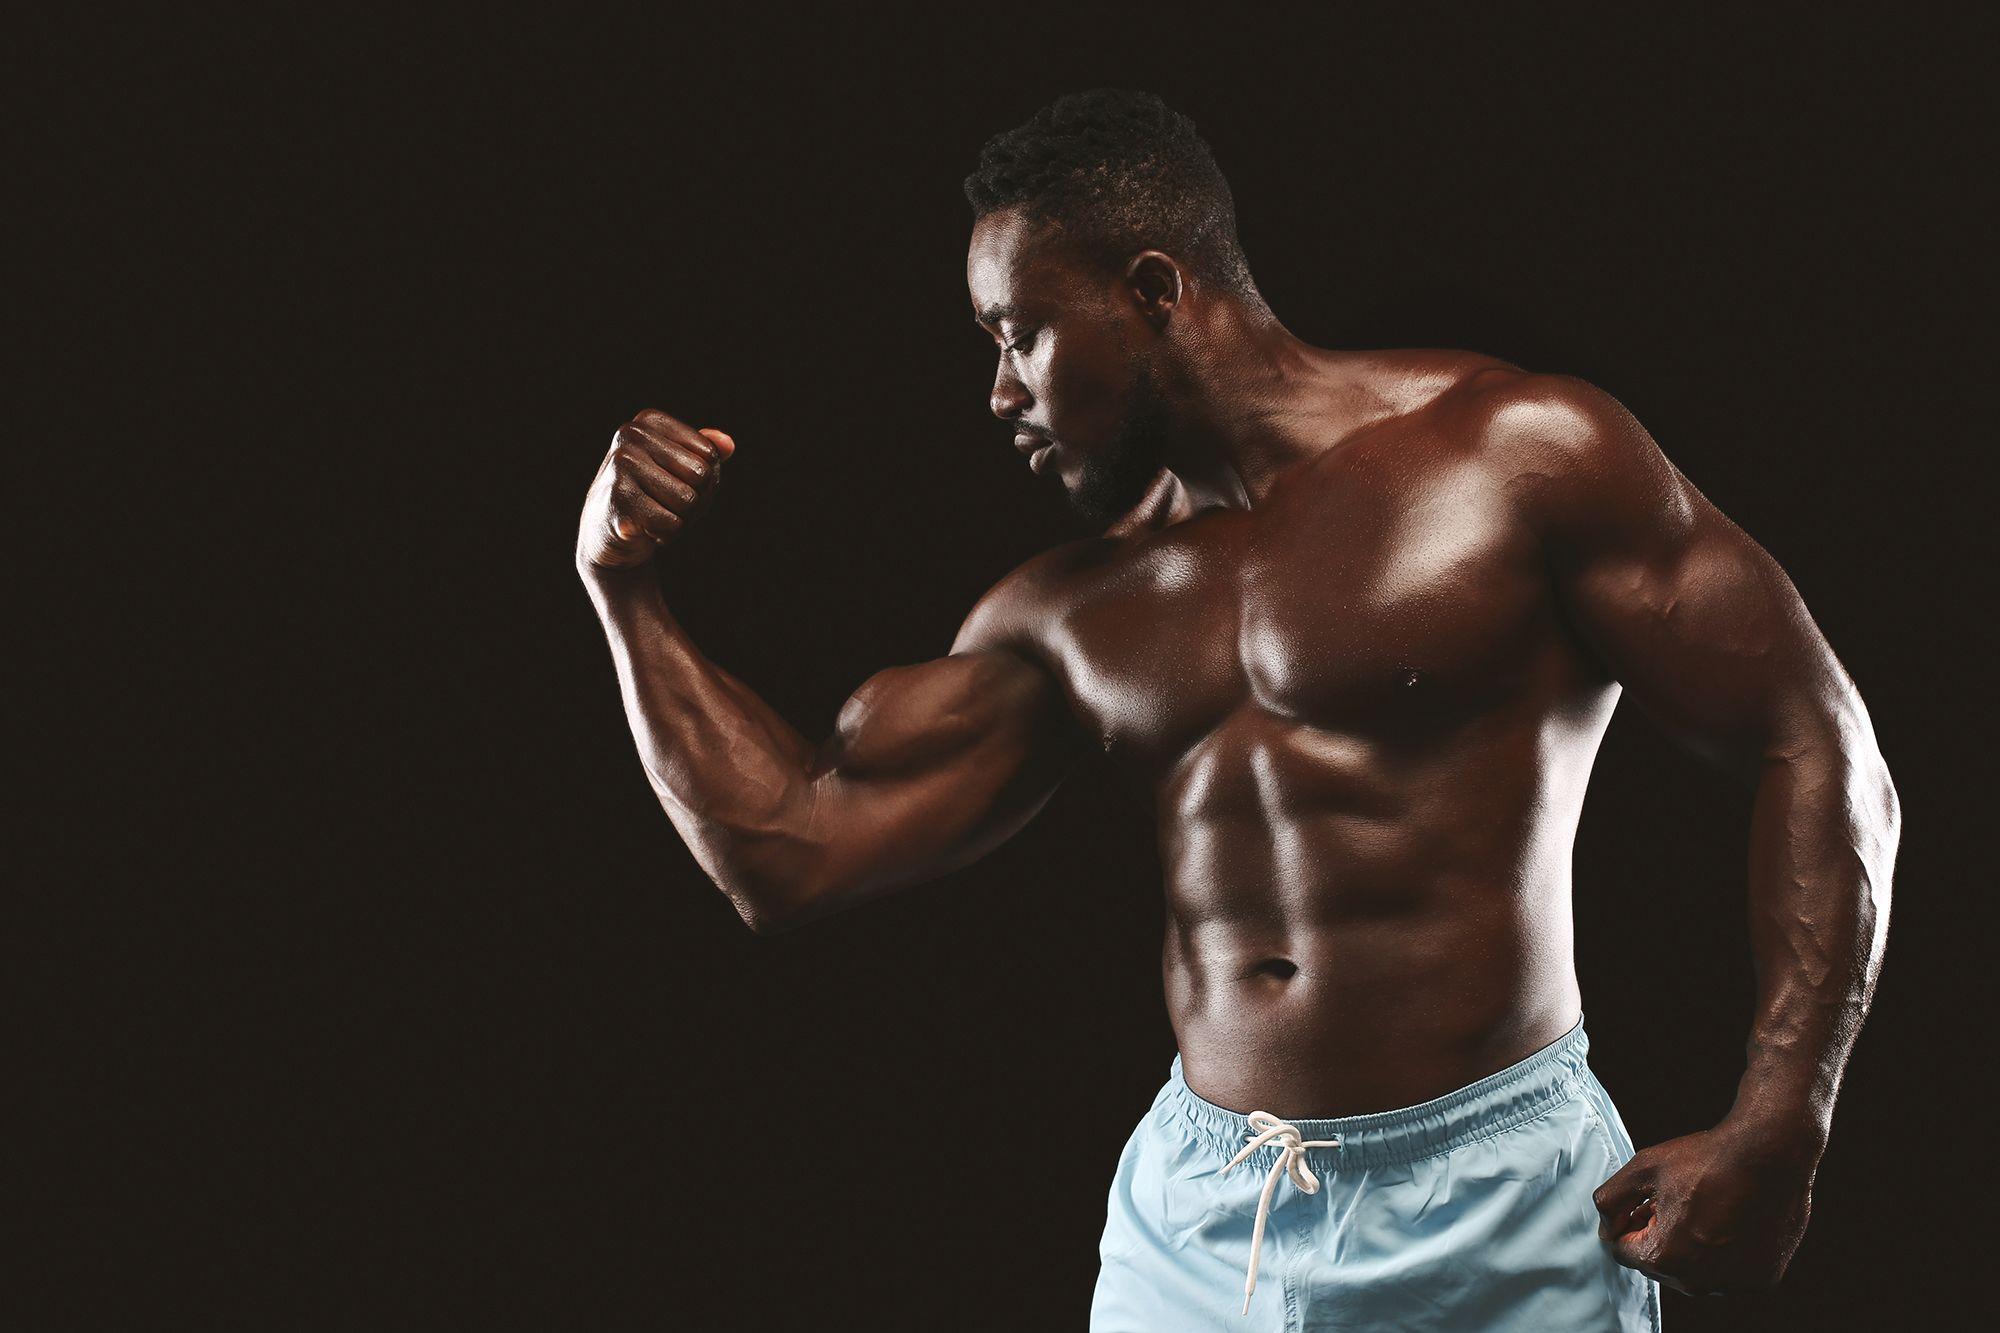 bodybuilder demonstrating his biceps